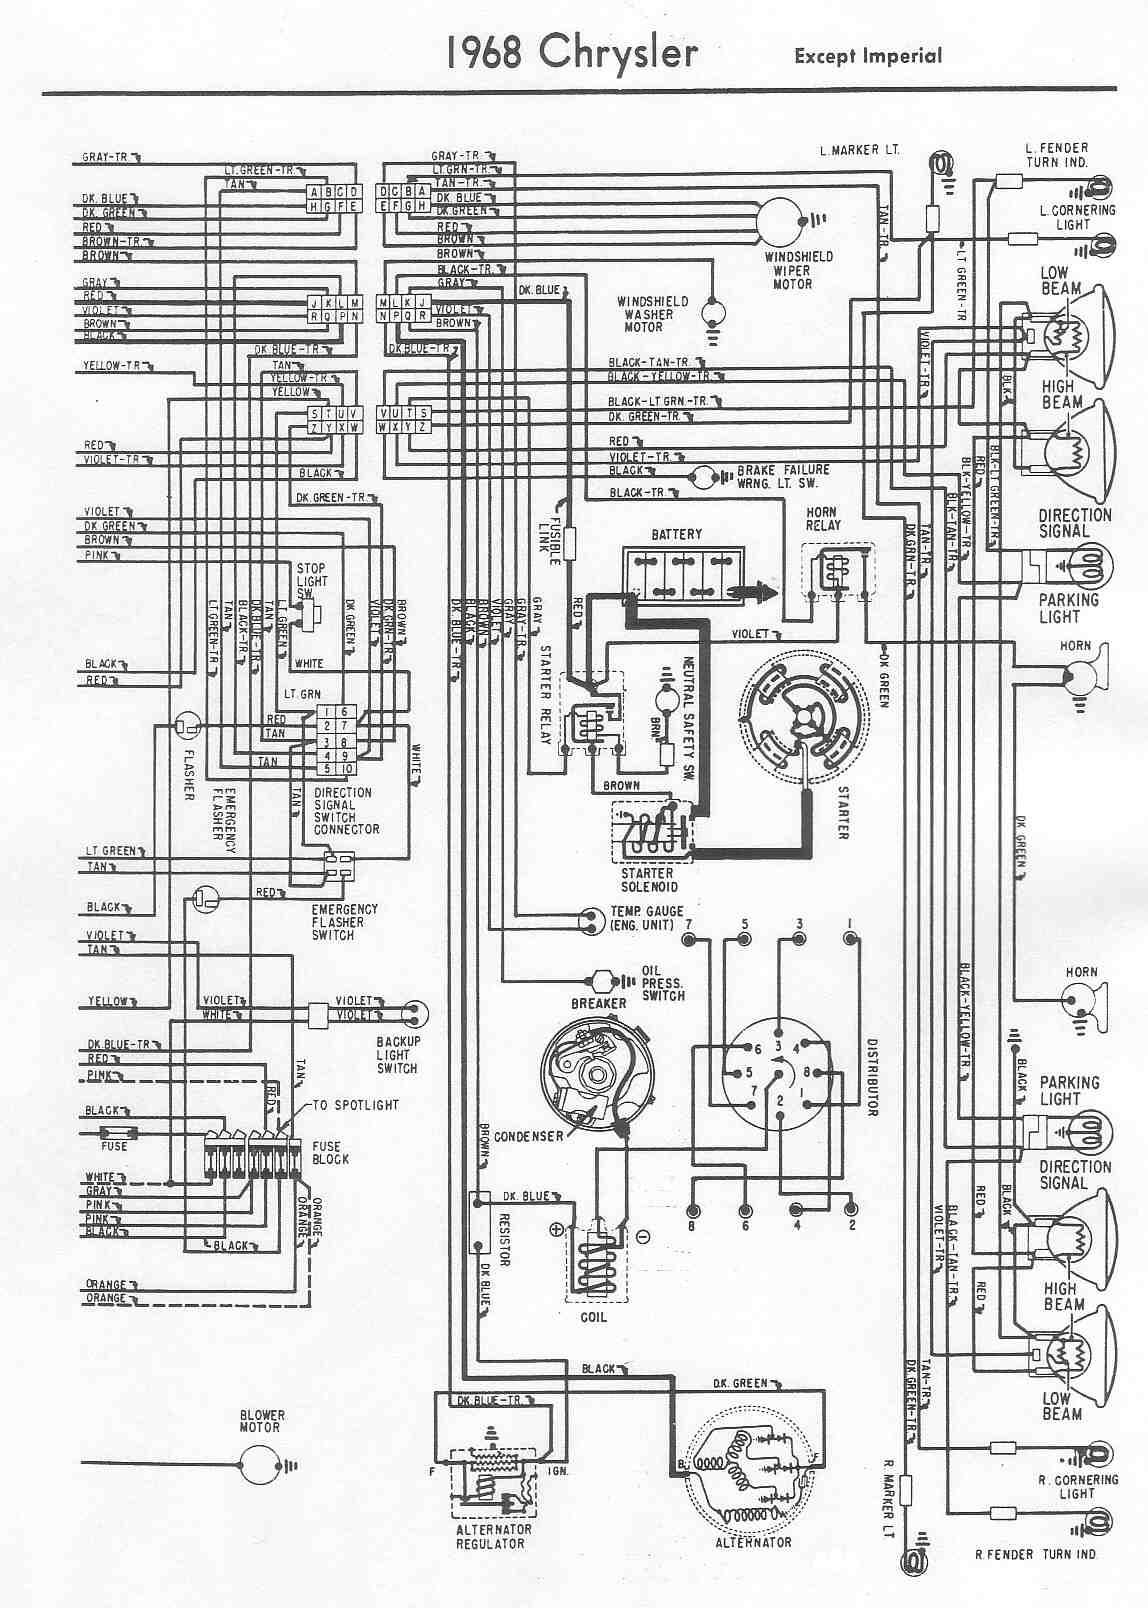 small resolution of 429 cadillac engine diagram free download wiring diagram schematic1968 cadillac engine diagram 6 stromoeko de u2022